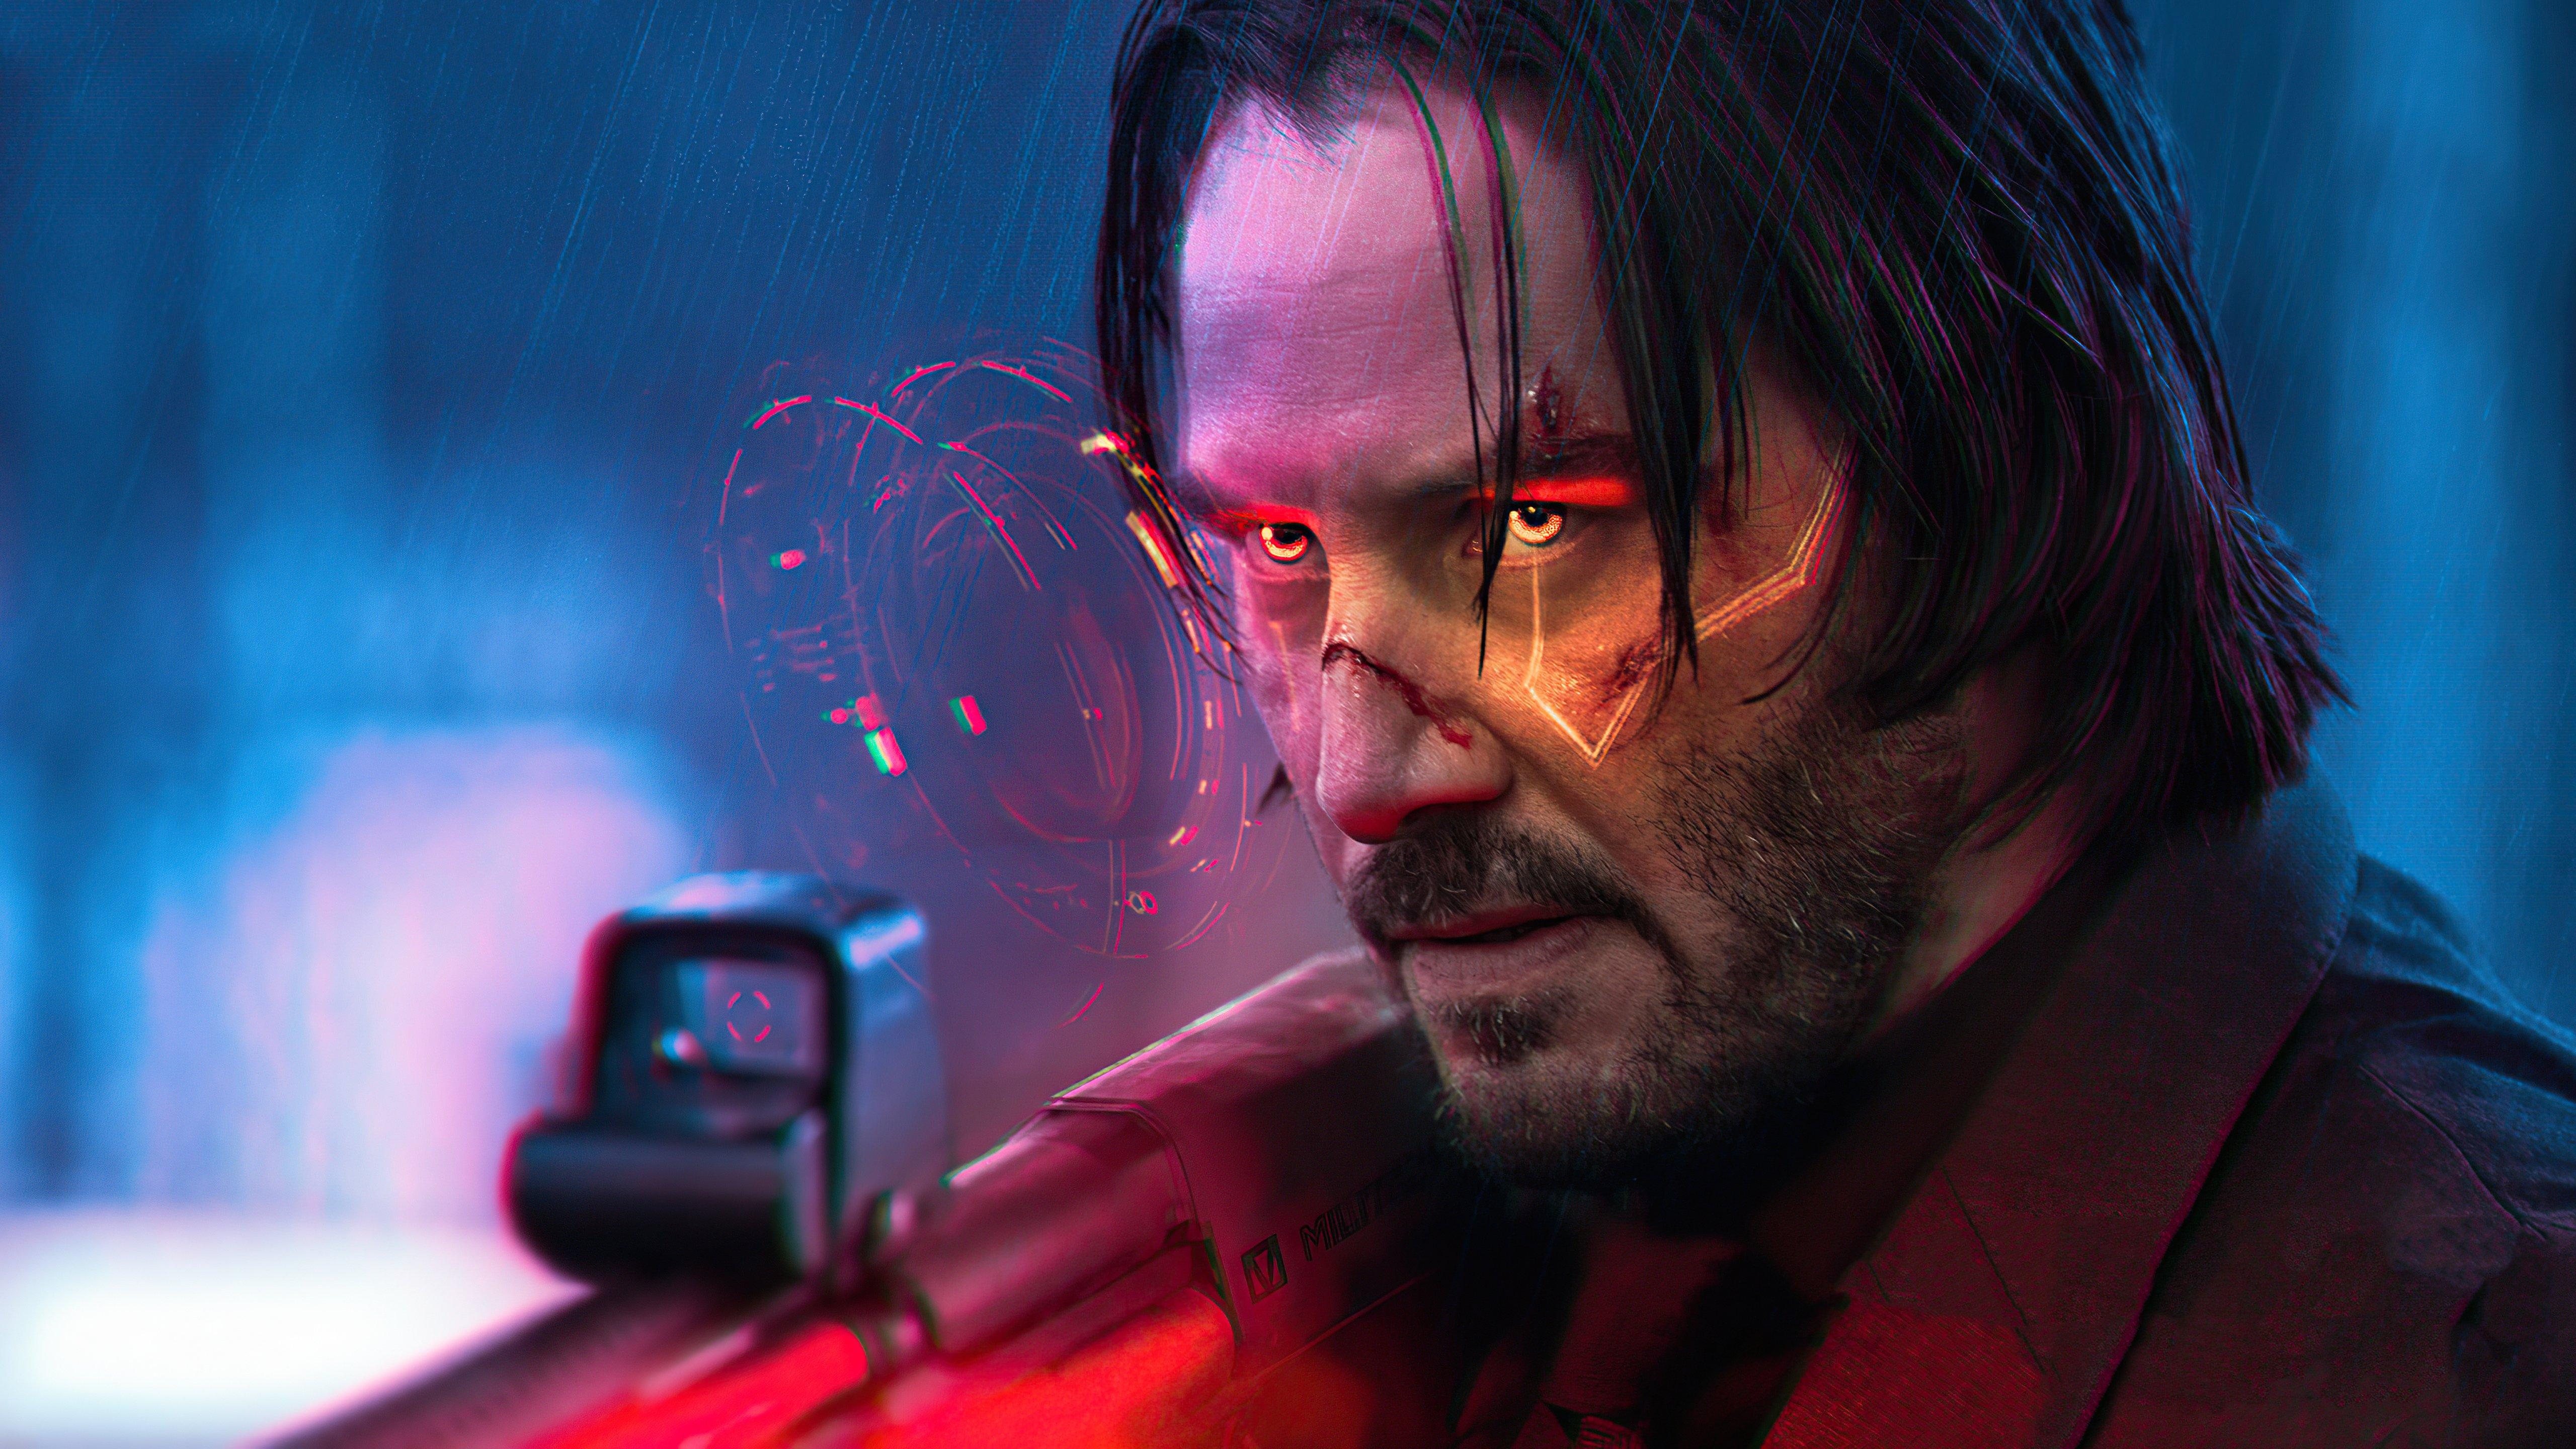 Wallpaper John Wick Cyberpunk 2077